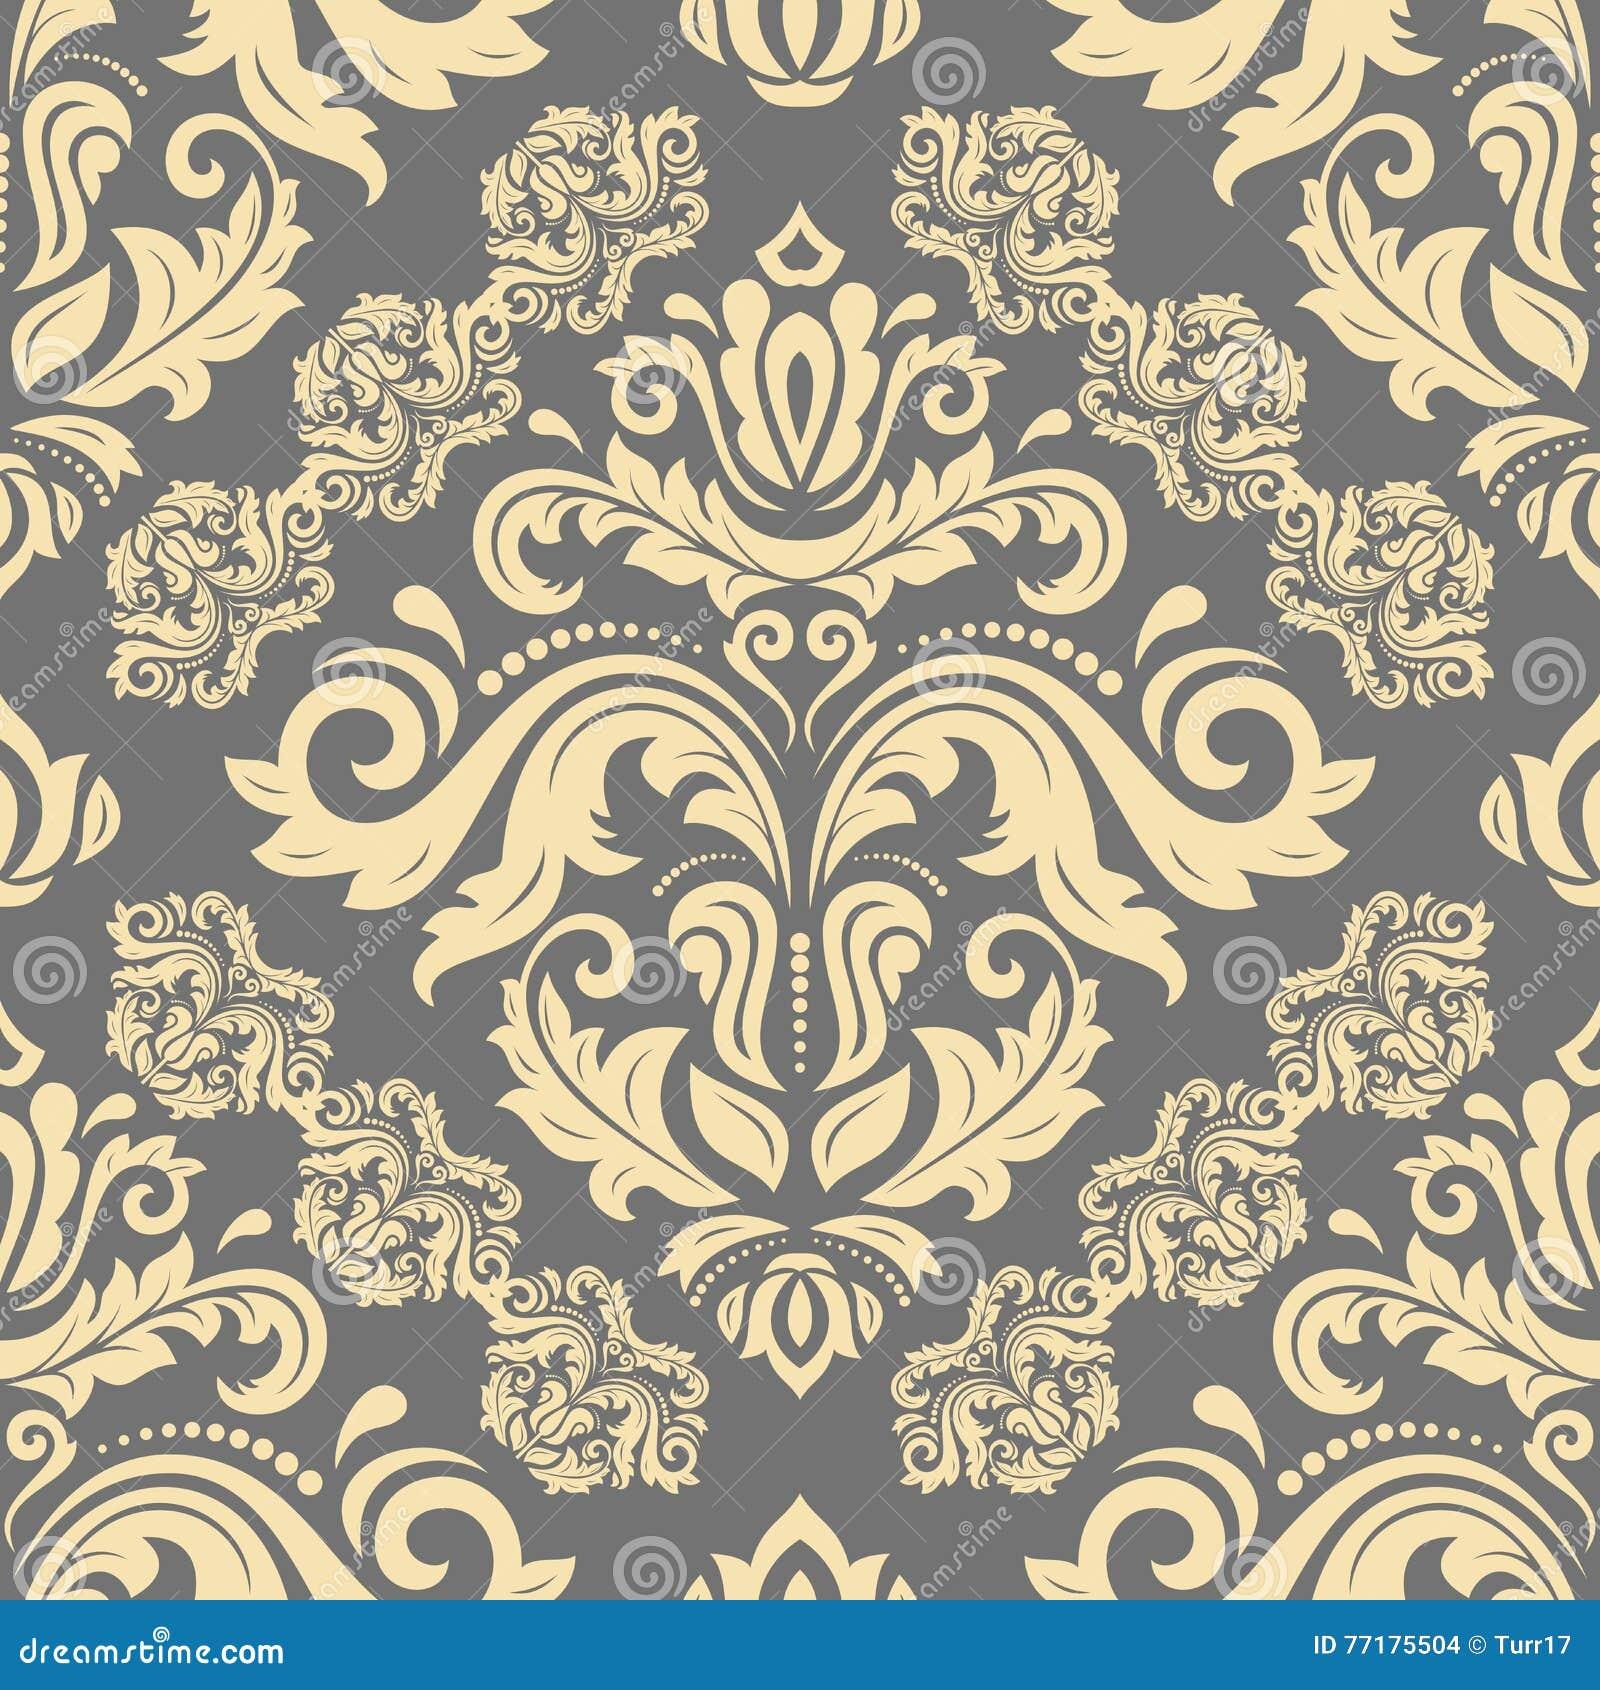 Bettwasche Barock Muster ~ Nahtloses vektor barock muster abbildung